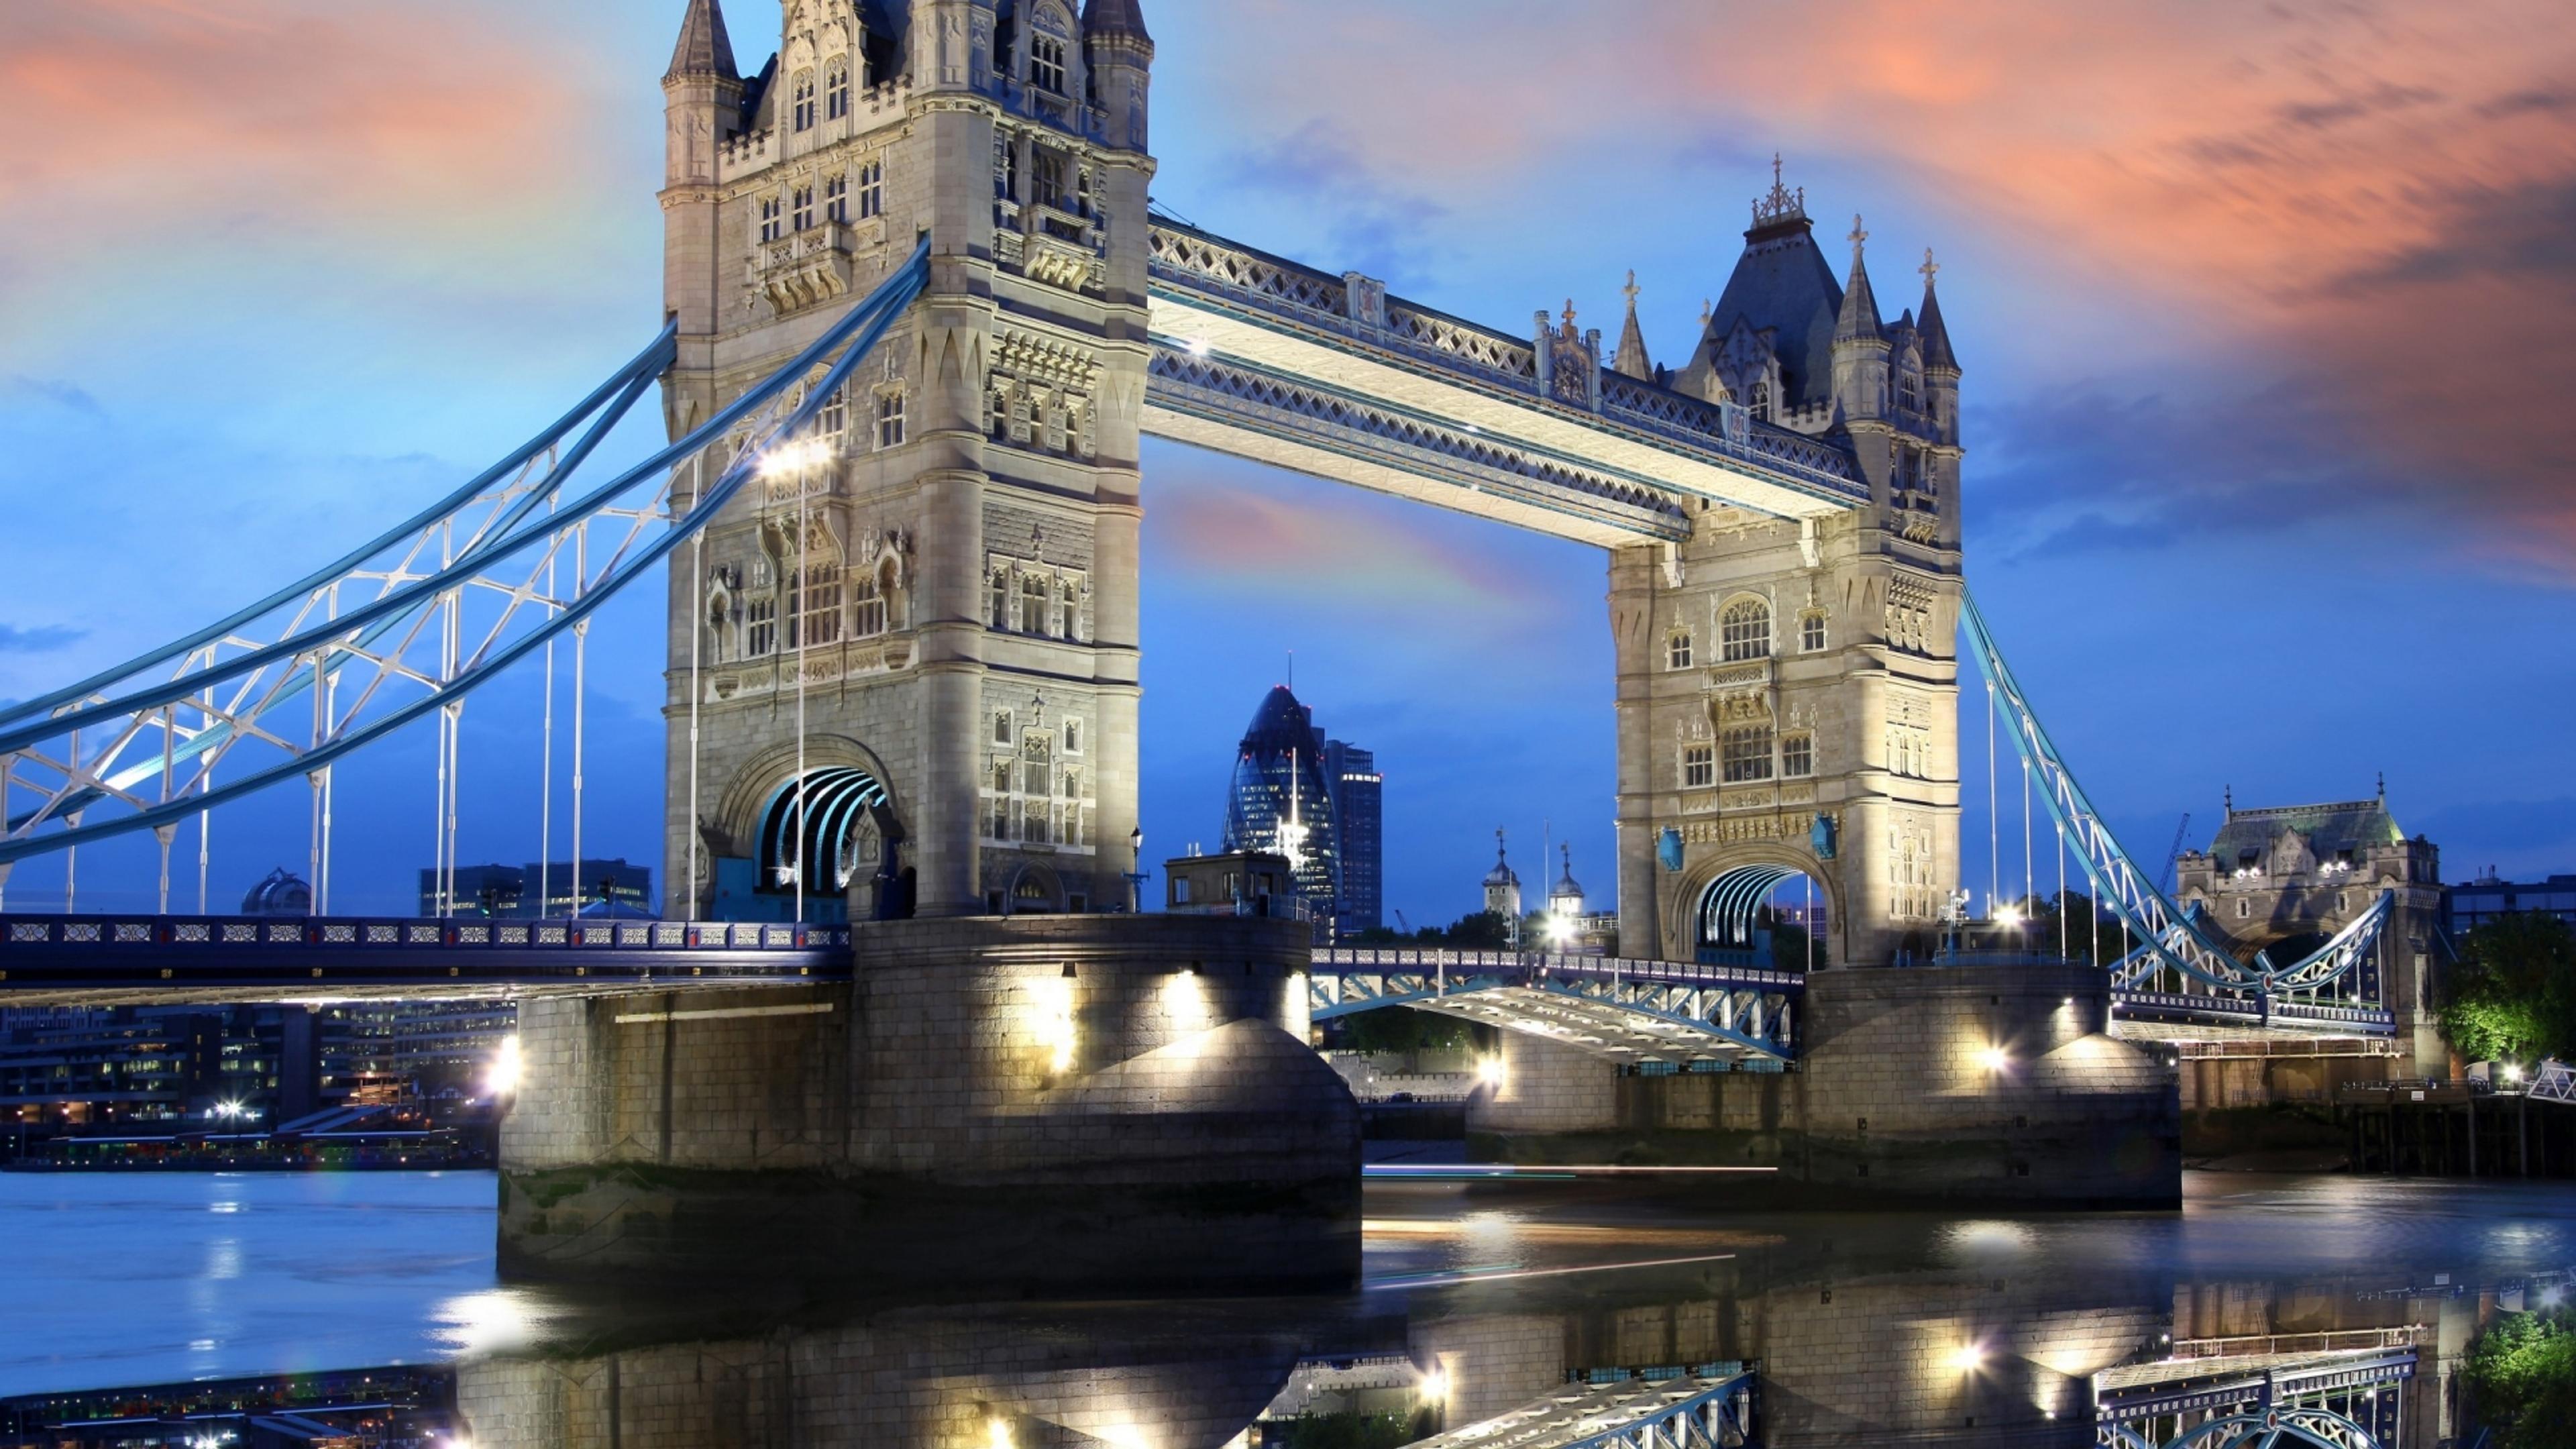 wallpaper bridge london scenic - photo #23